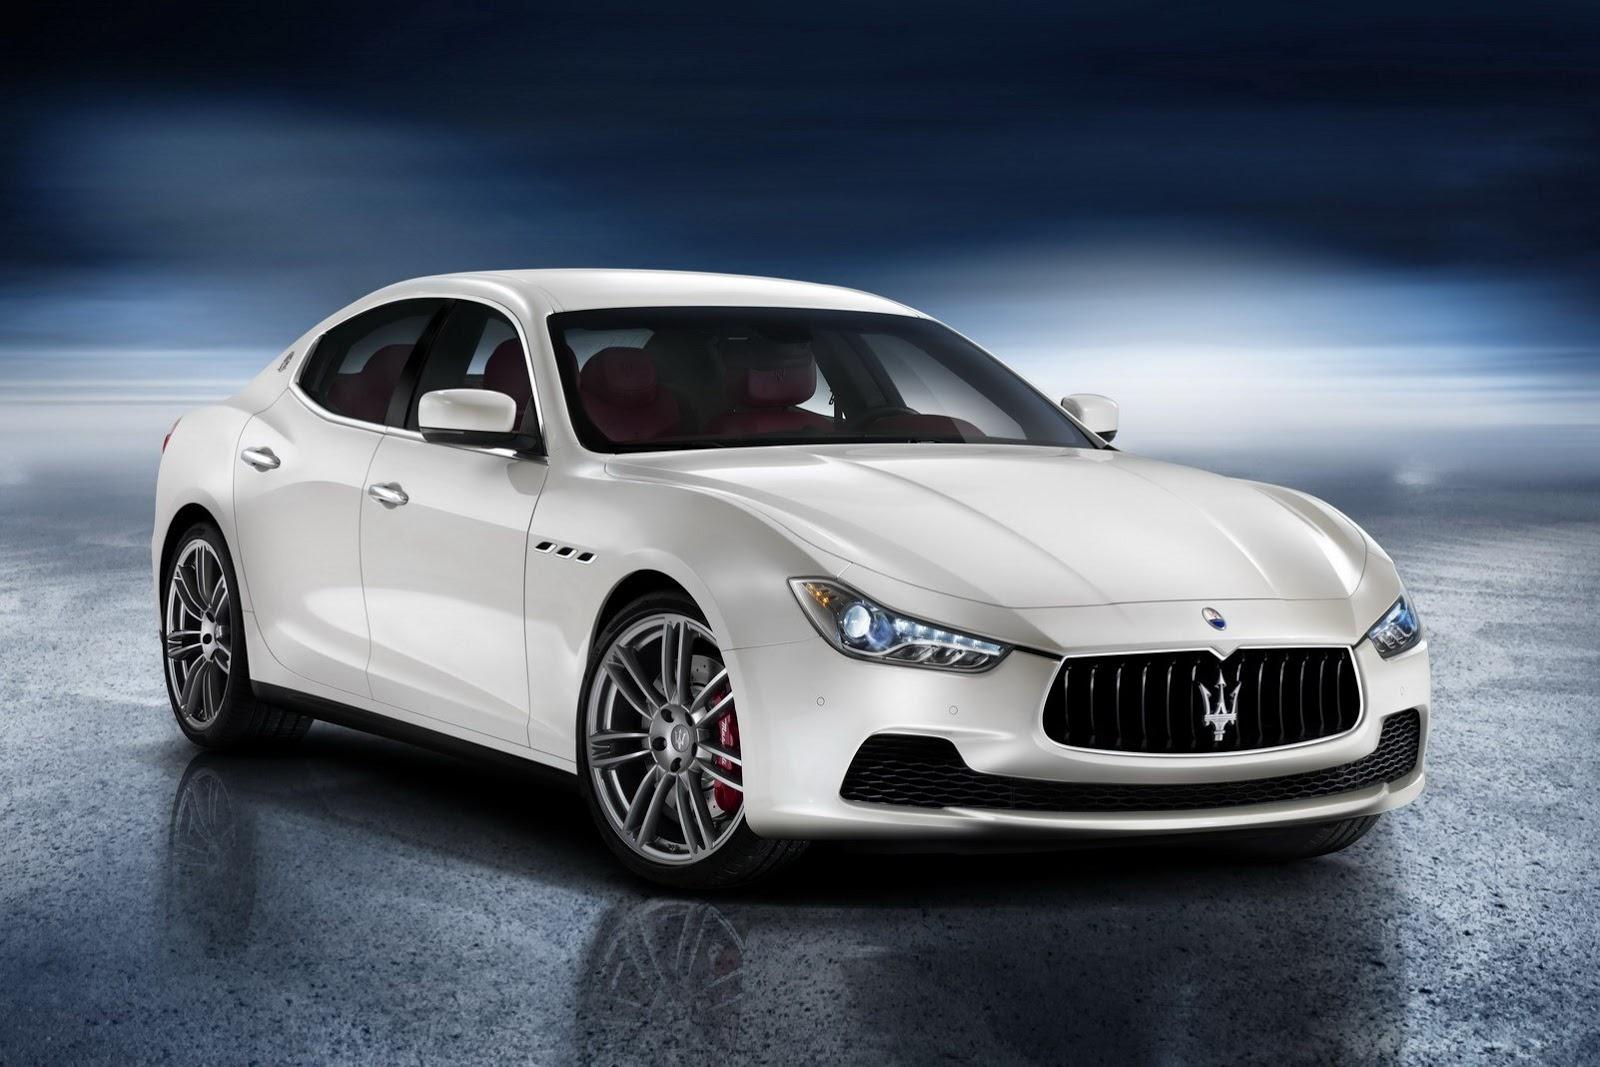 [Image: Maserati-Ghibli-4%25255B2%25255D.jpg]